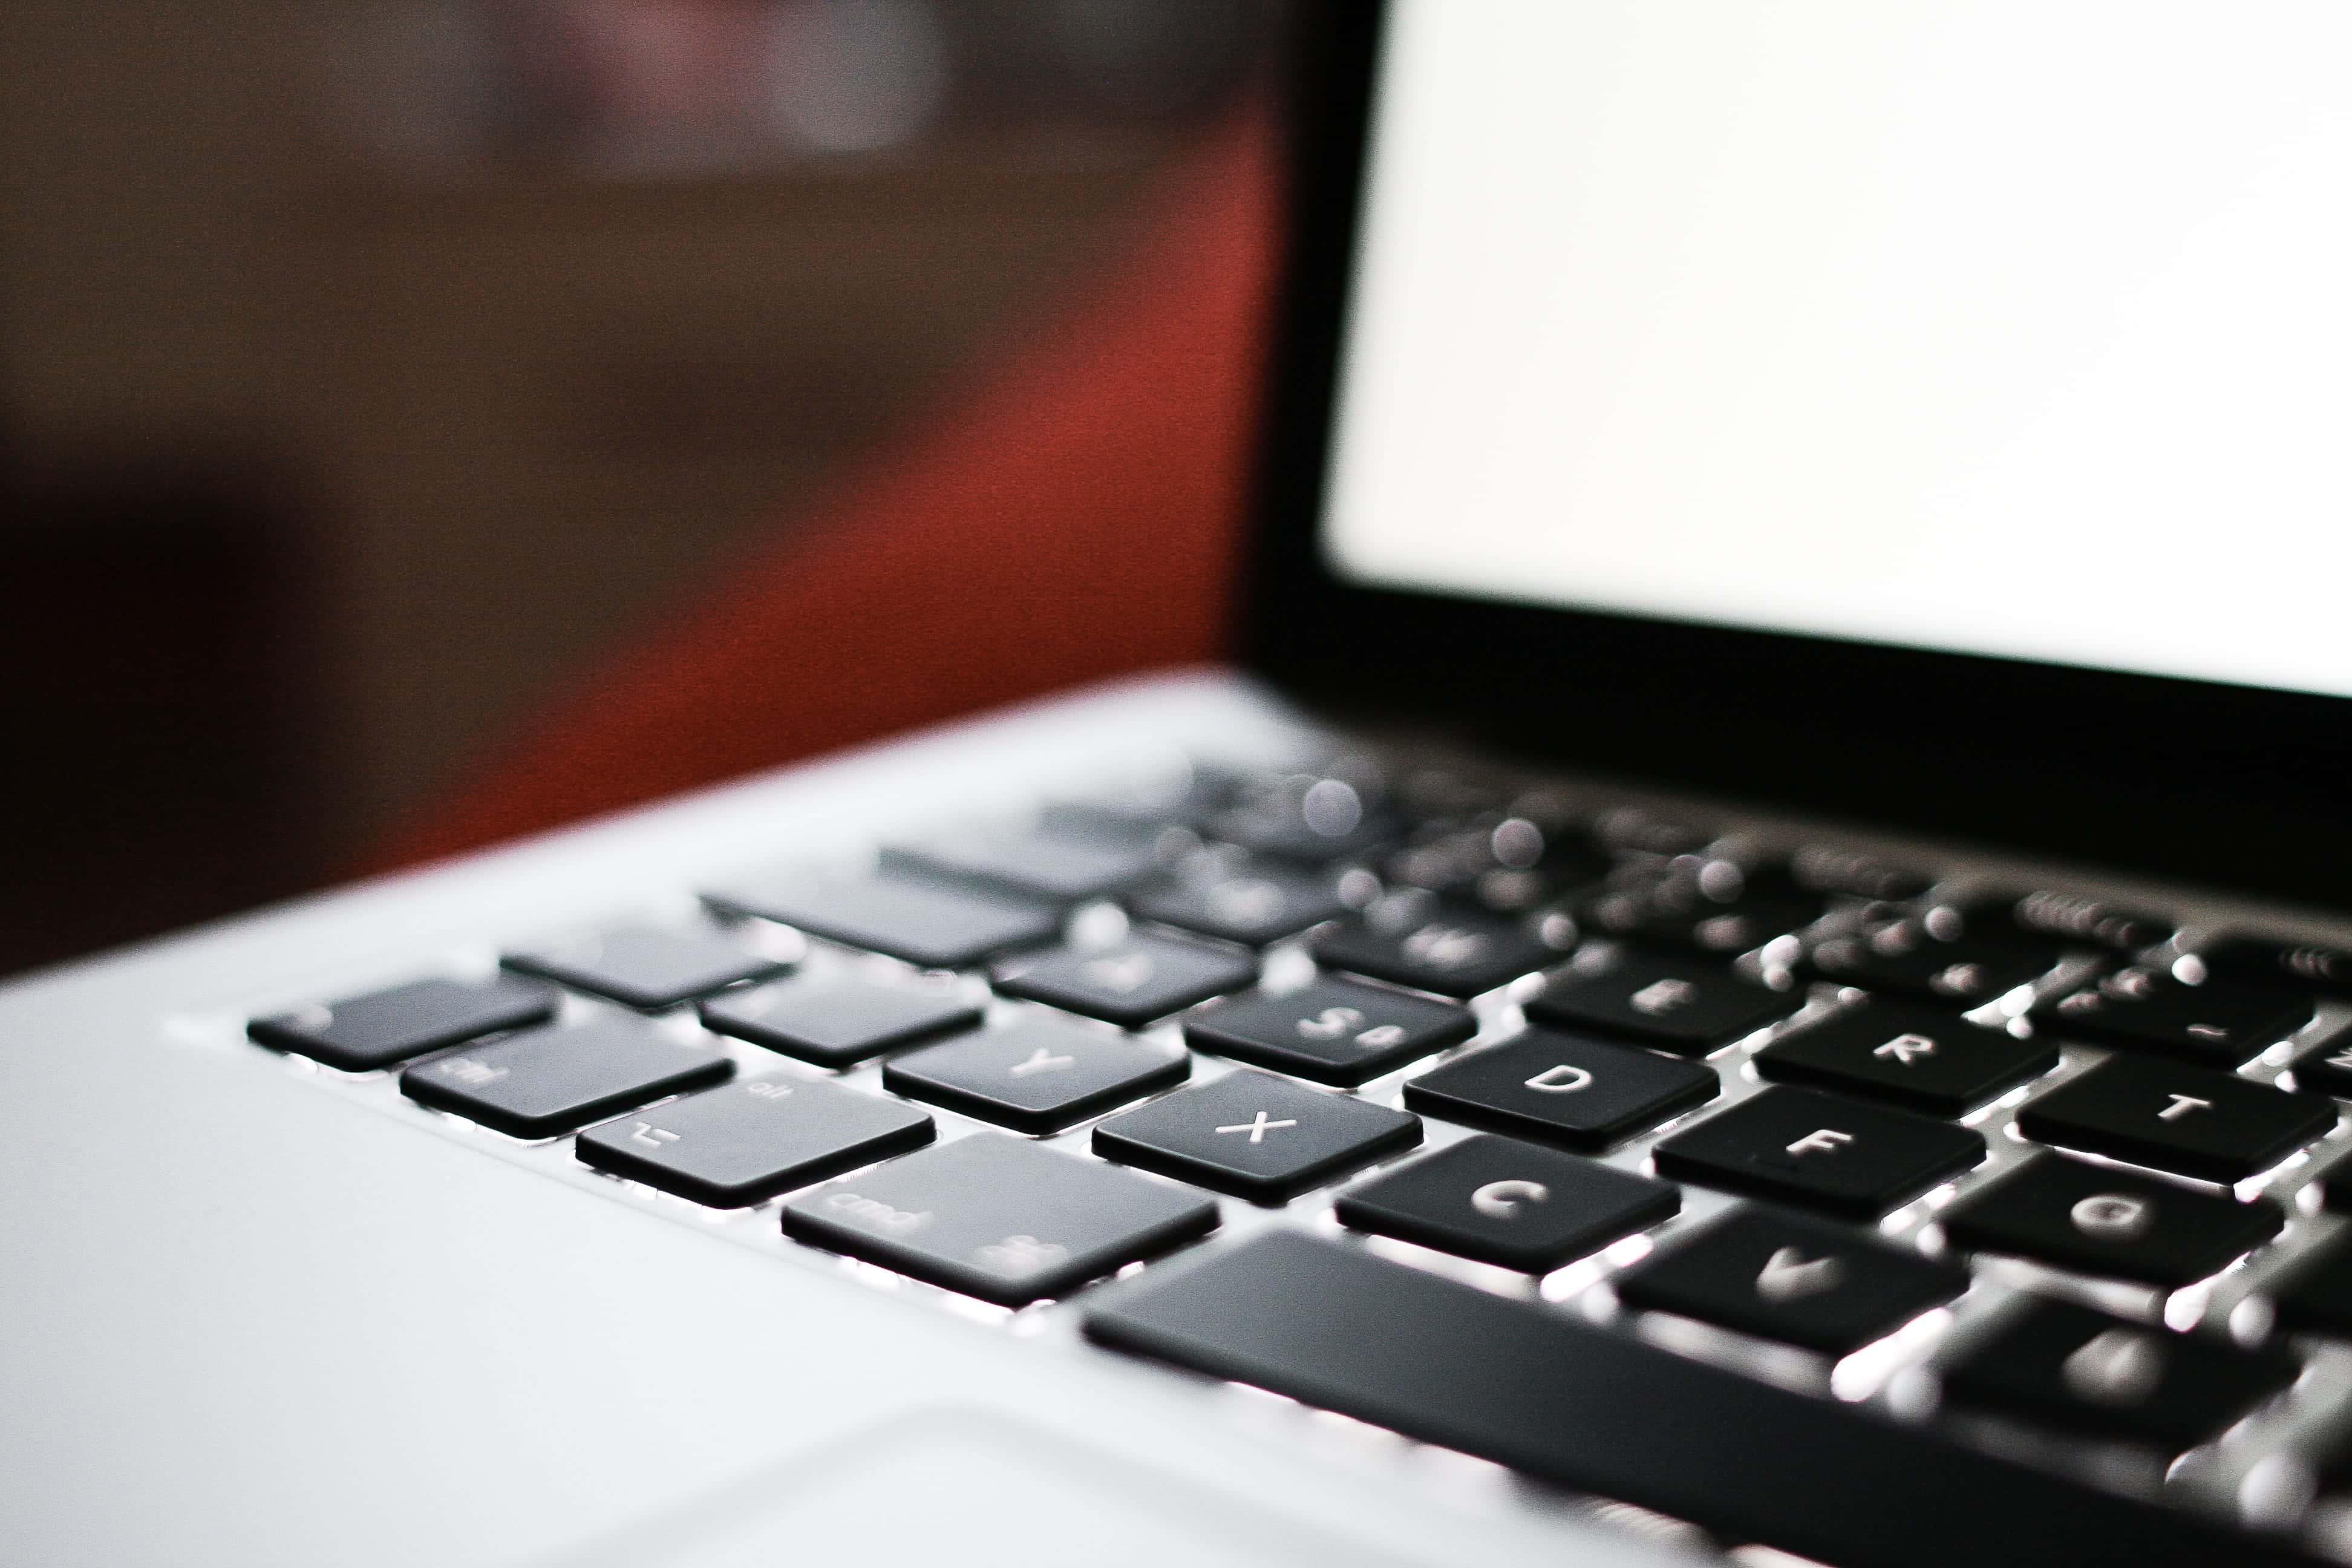 macbook praca na baterii, jak obsługiwać Maca